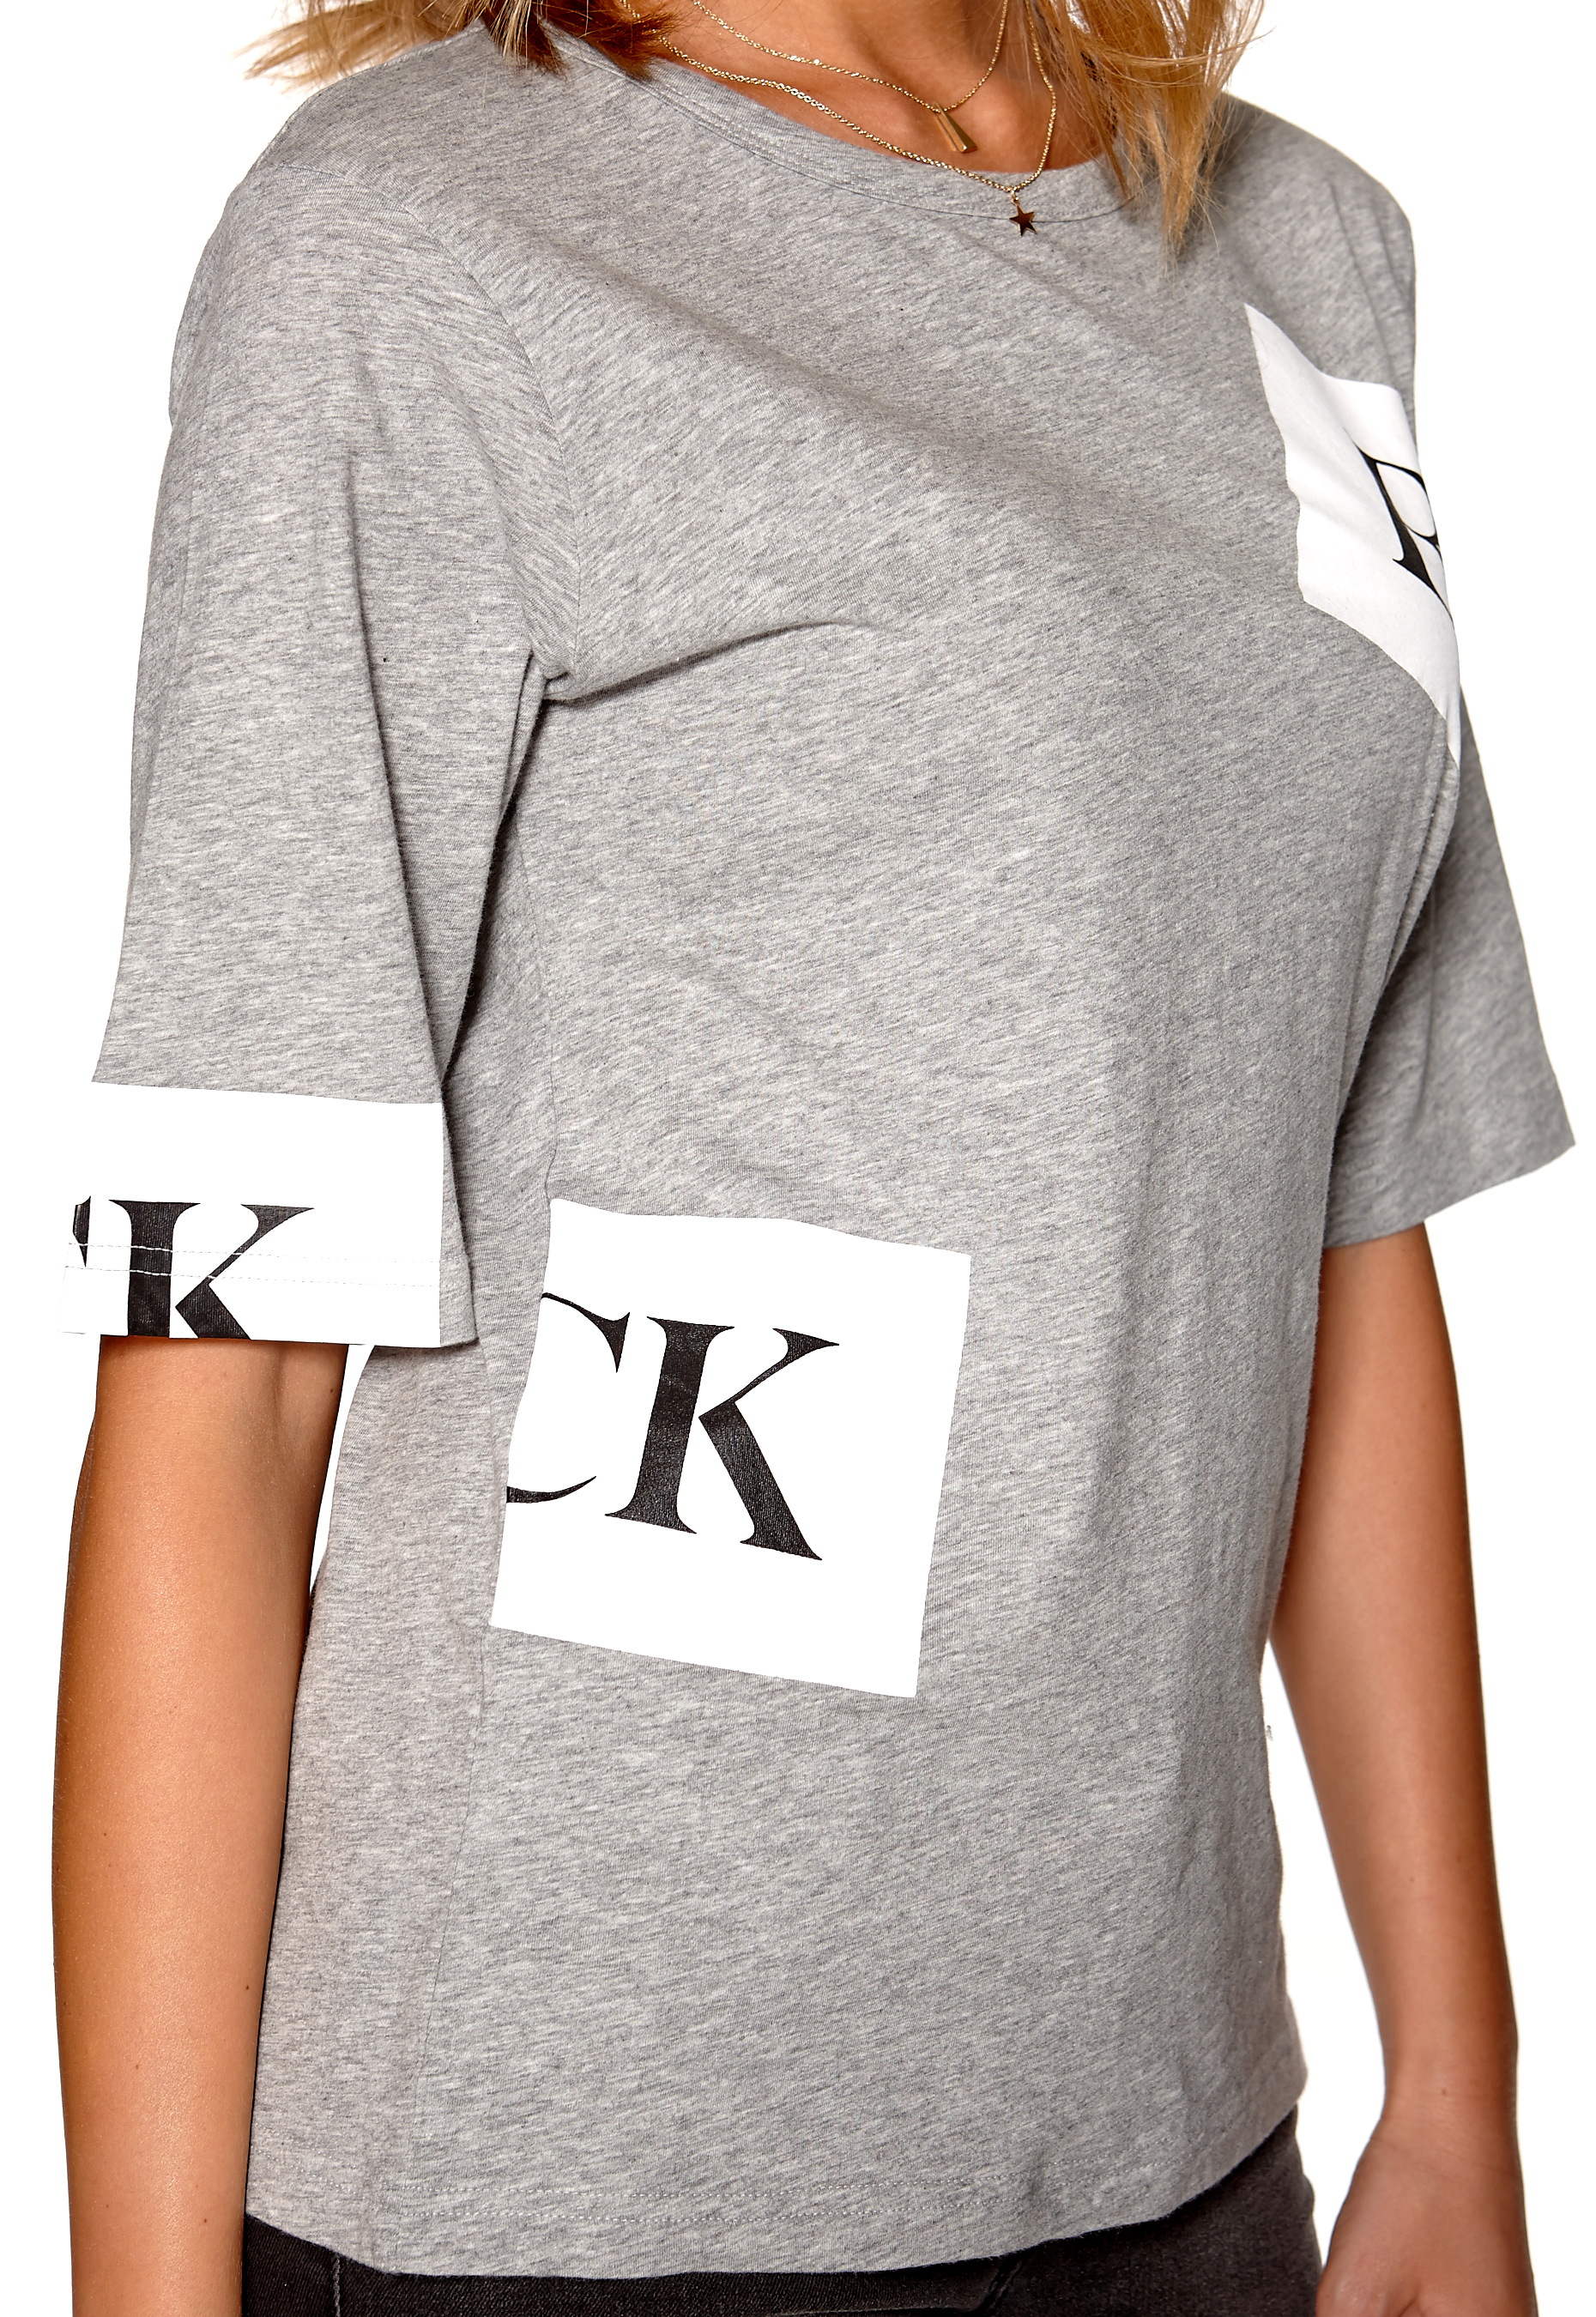 Back banner t shirt grey marl bubbleroom for Grey marl t shirt